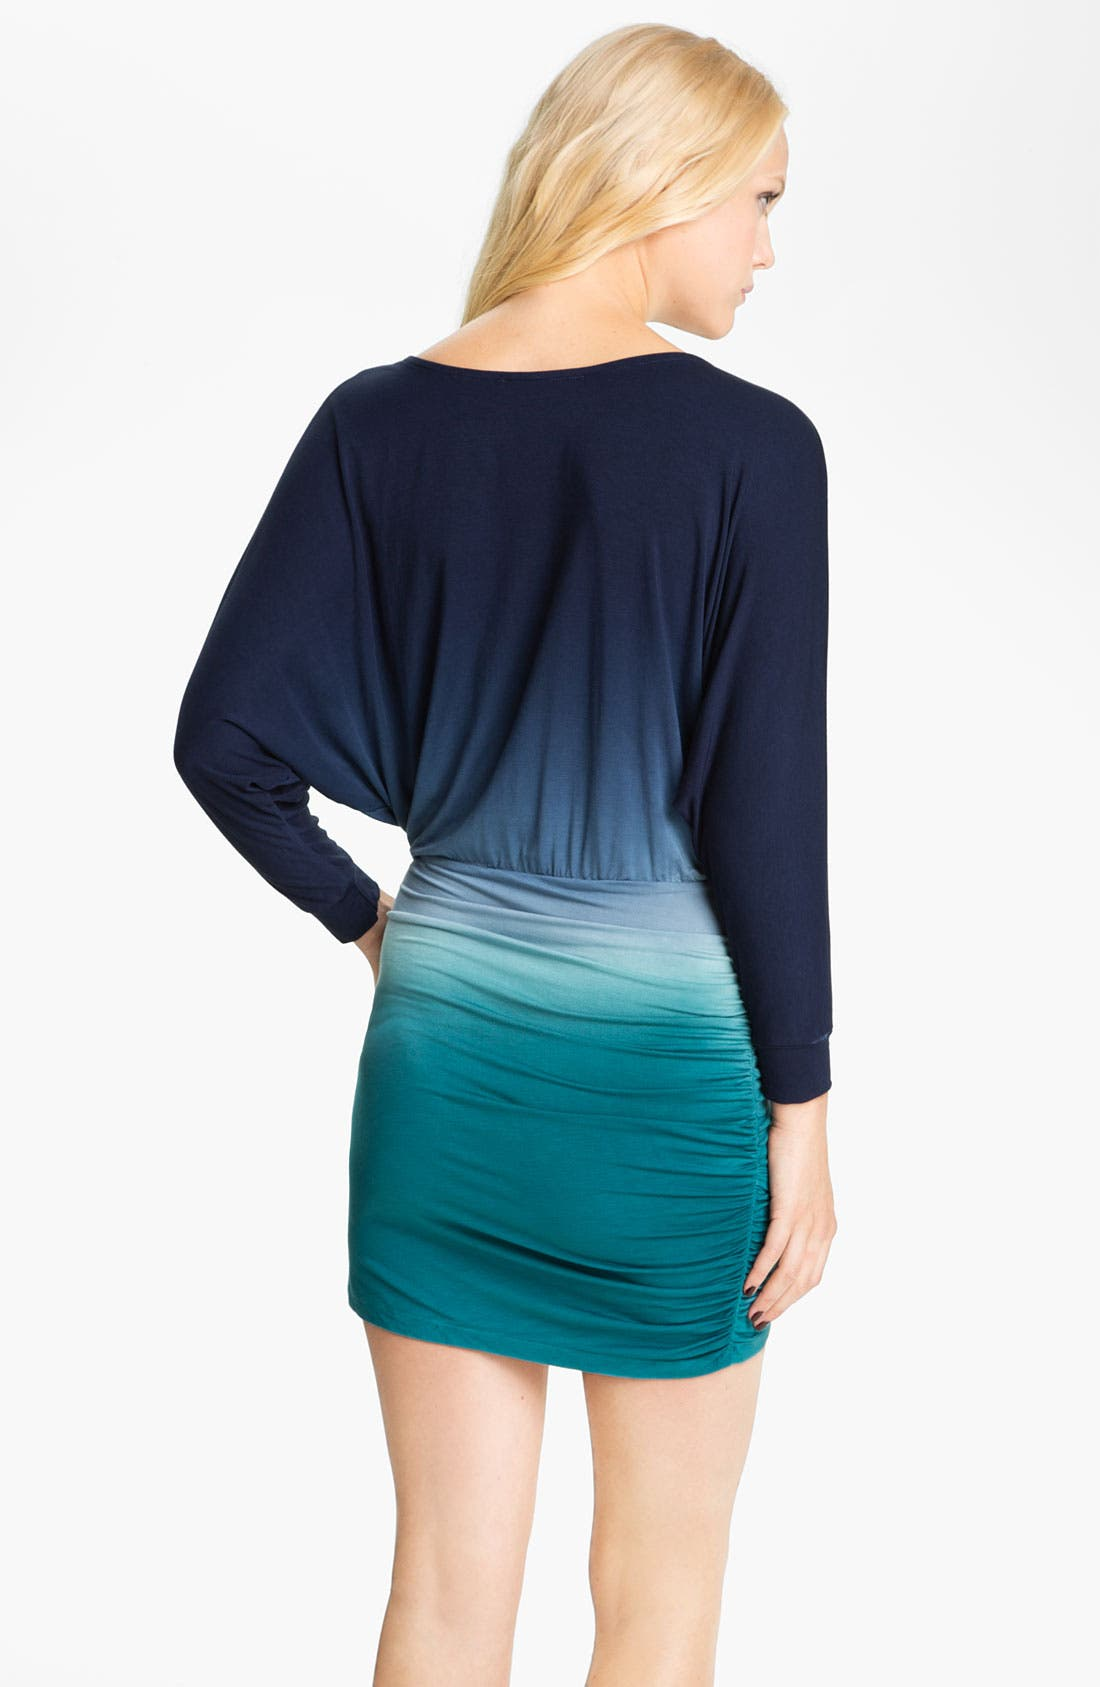 Alternate Image 2  - Young, Fabulous & Broke 'Heidi' Tie Dye Dolman Dress